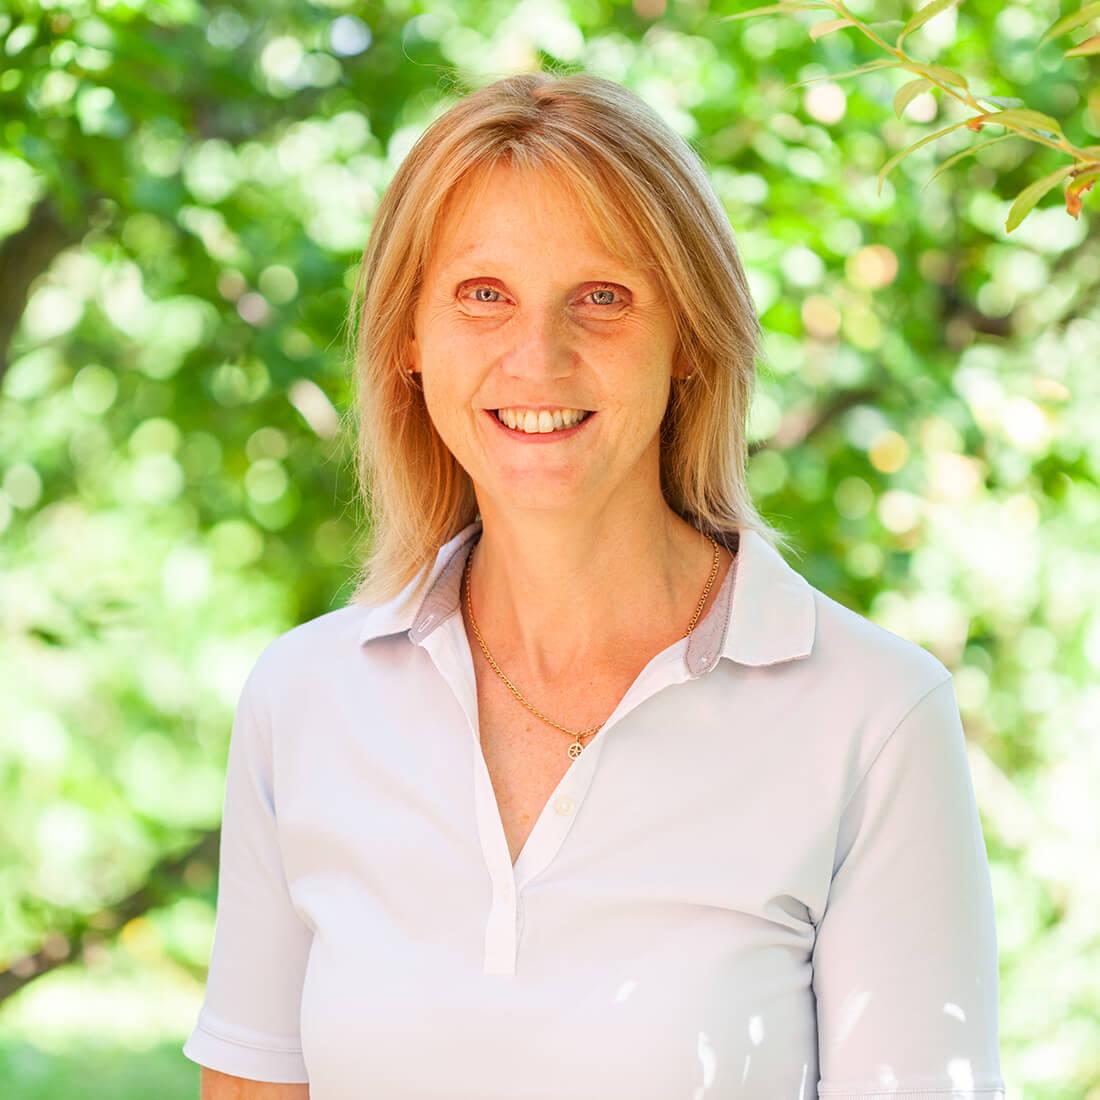 Hausarzt Bernhardsthal - Neugebauer - Team - Helga Neugebauer